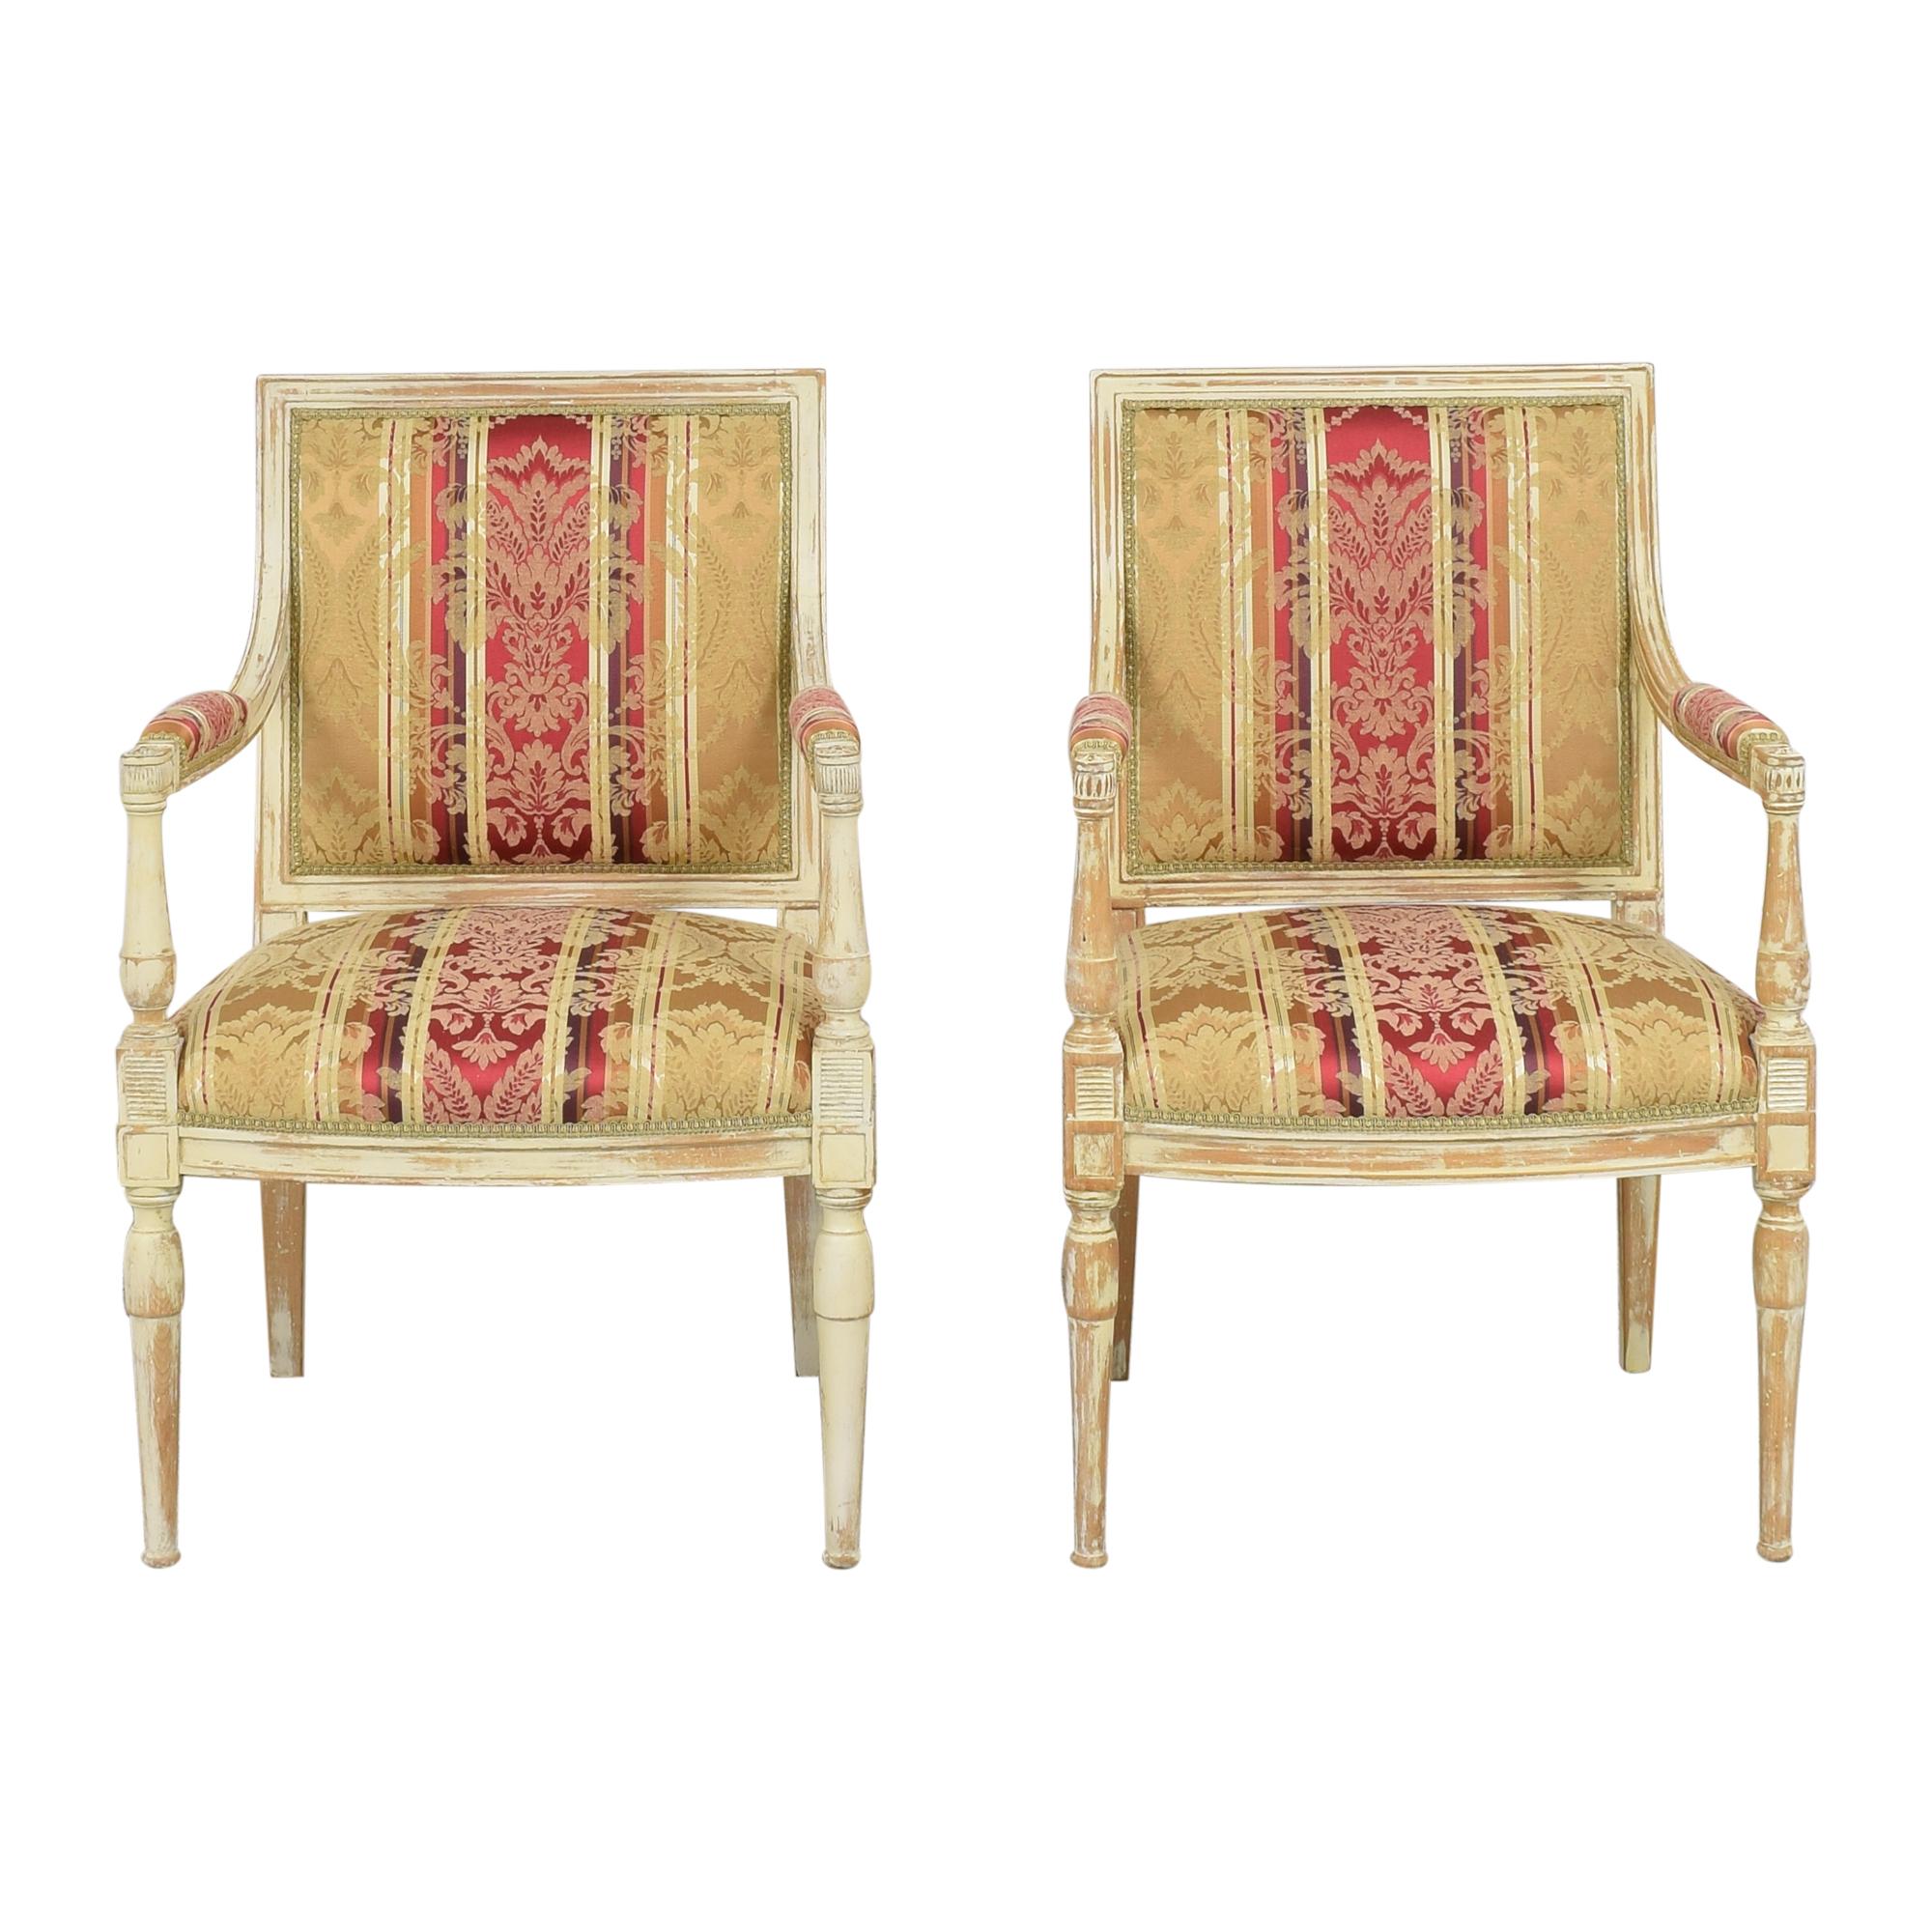 shop ABC Carpet & Home Louis XVI Style Chairs ABC Carpet & Home Dining Chairs